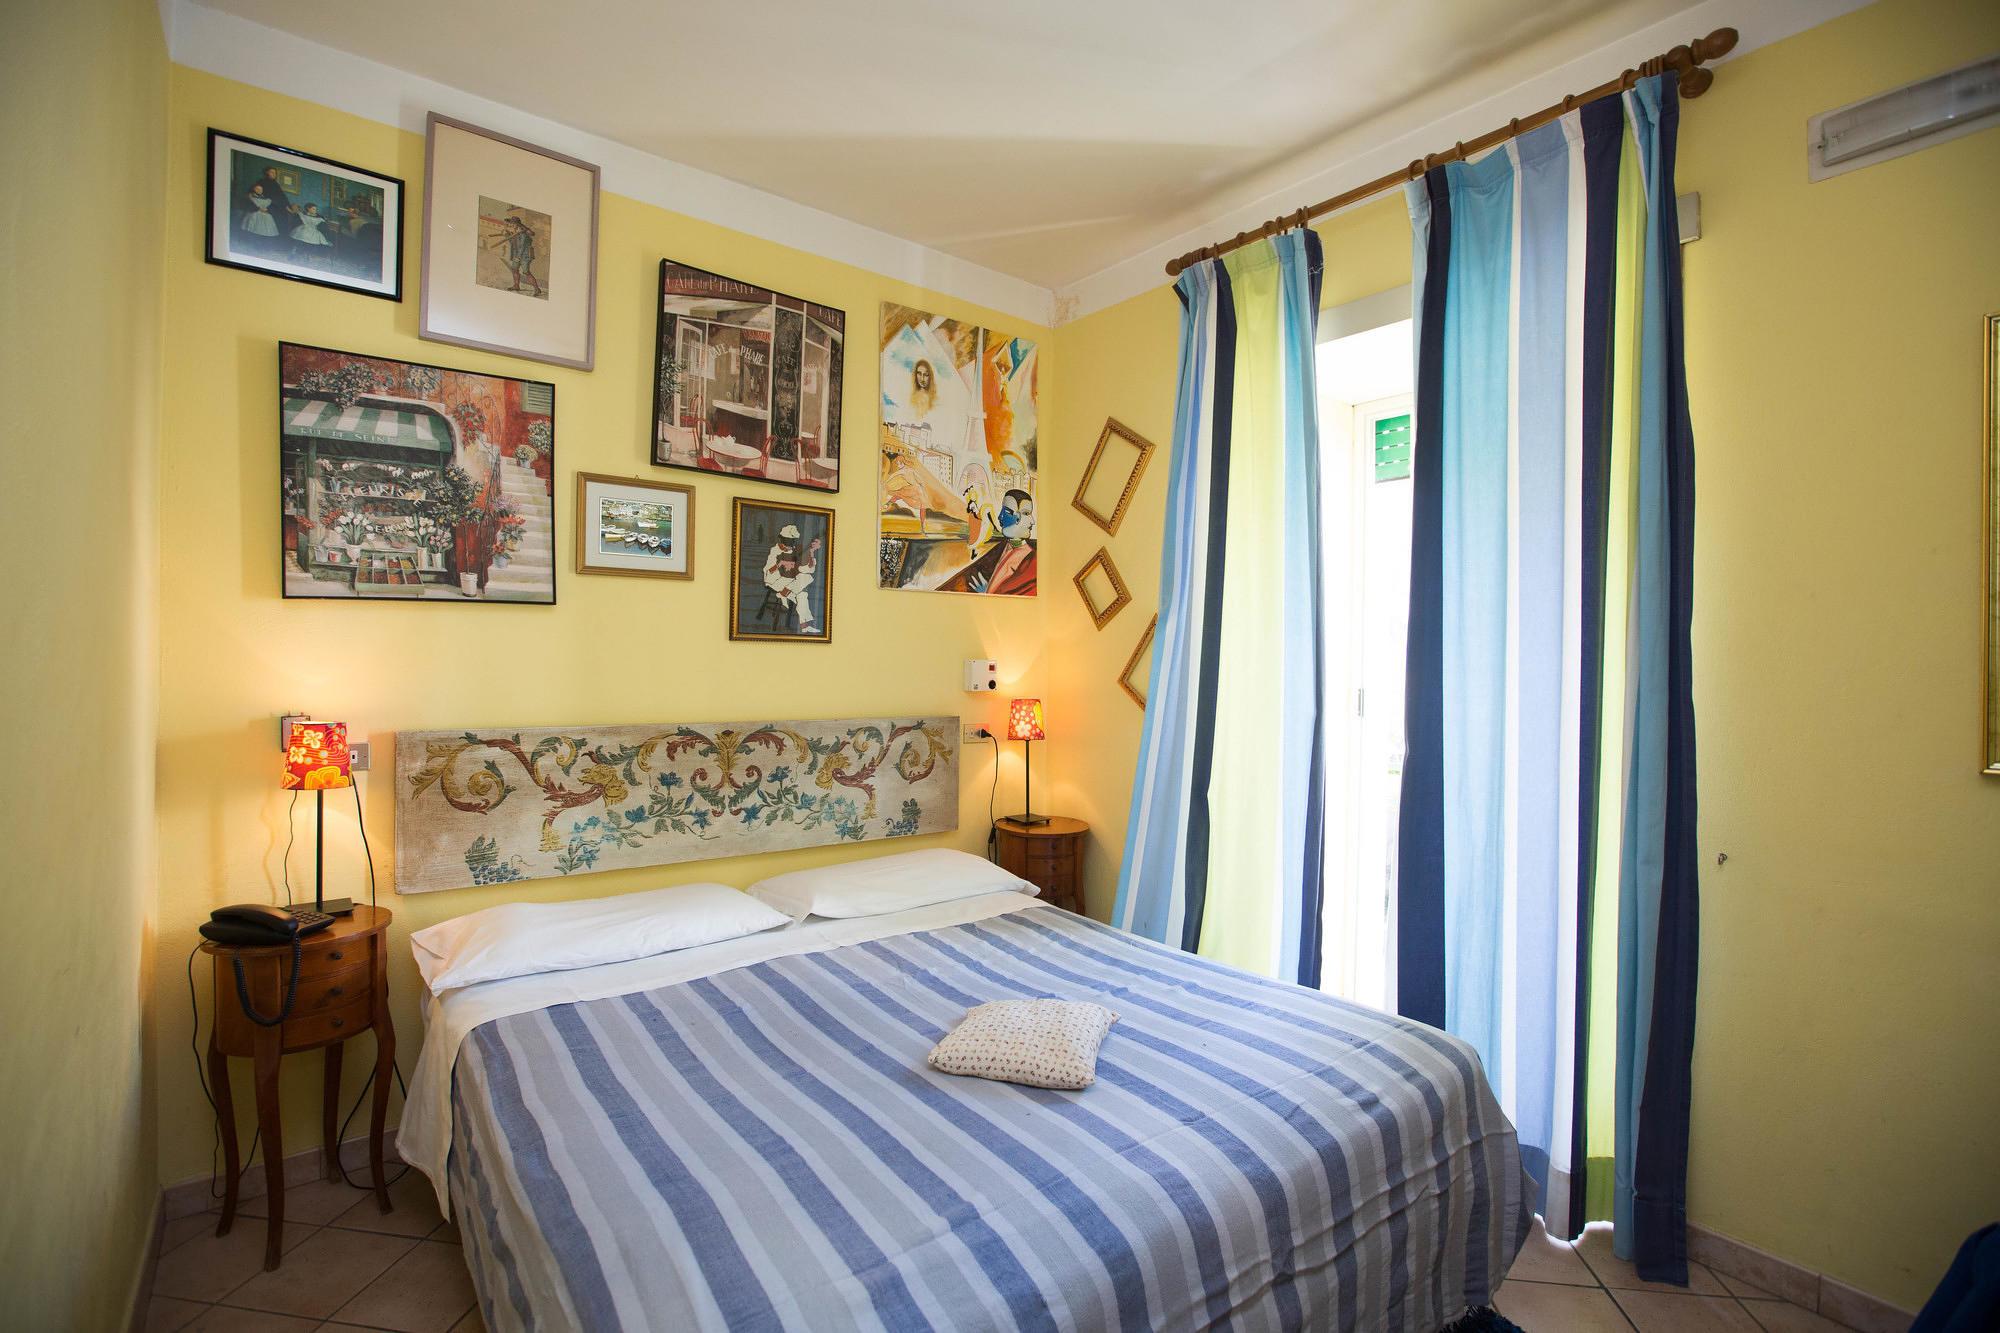 Parigi Room at Hotel Europeo & Flowers in Naples, Italy